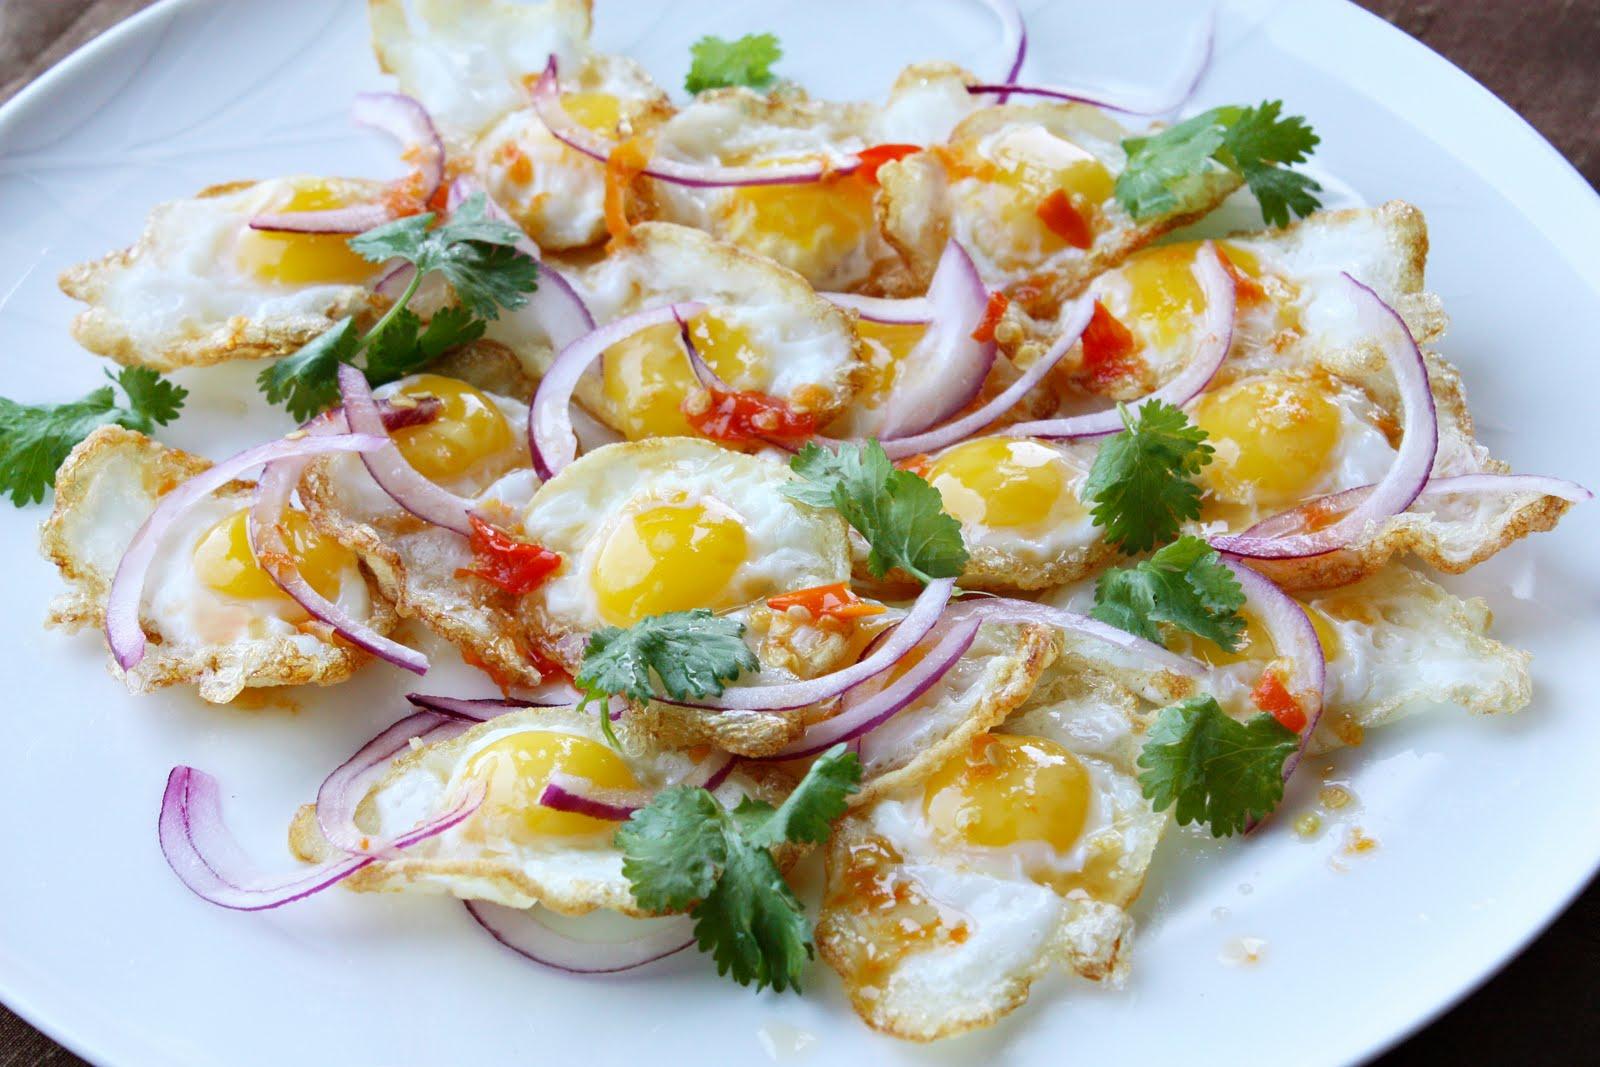 Tasty Thai Food Recipes Easy Egg Salad Spicy Fried Egg Salad